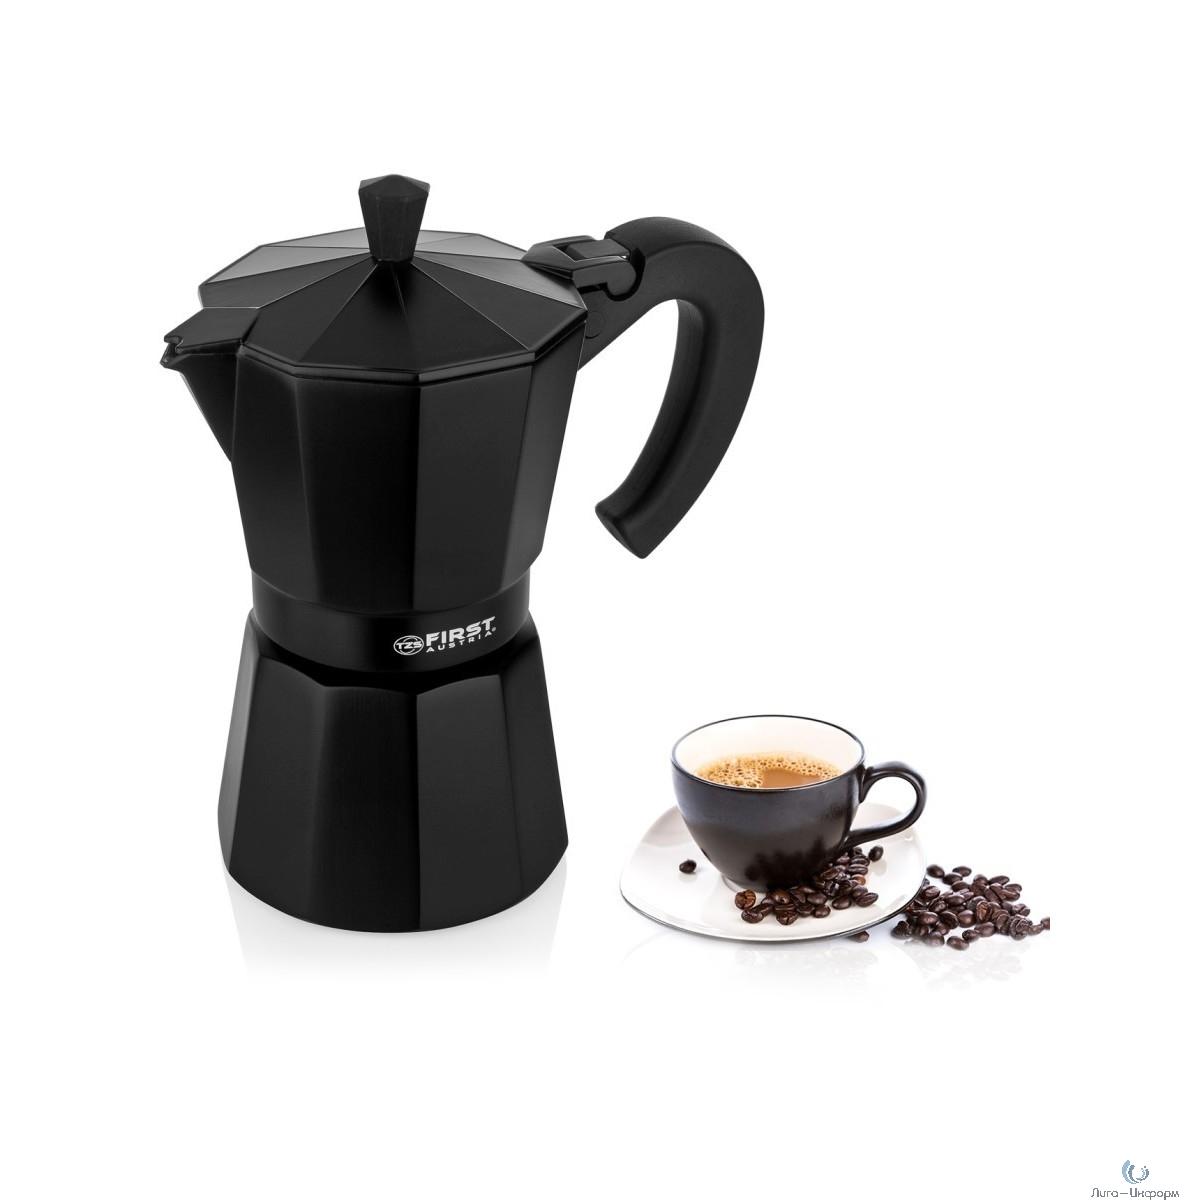 FIRST (FA-5471 Black) Кофеварка гейзерная, Объем 300 мл / 6 чашек.Для использования на горячей плите